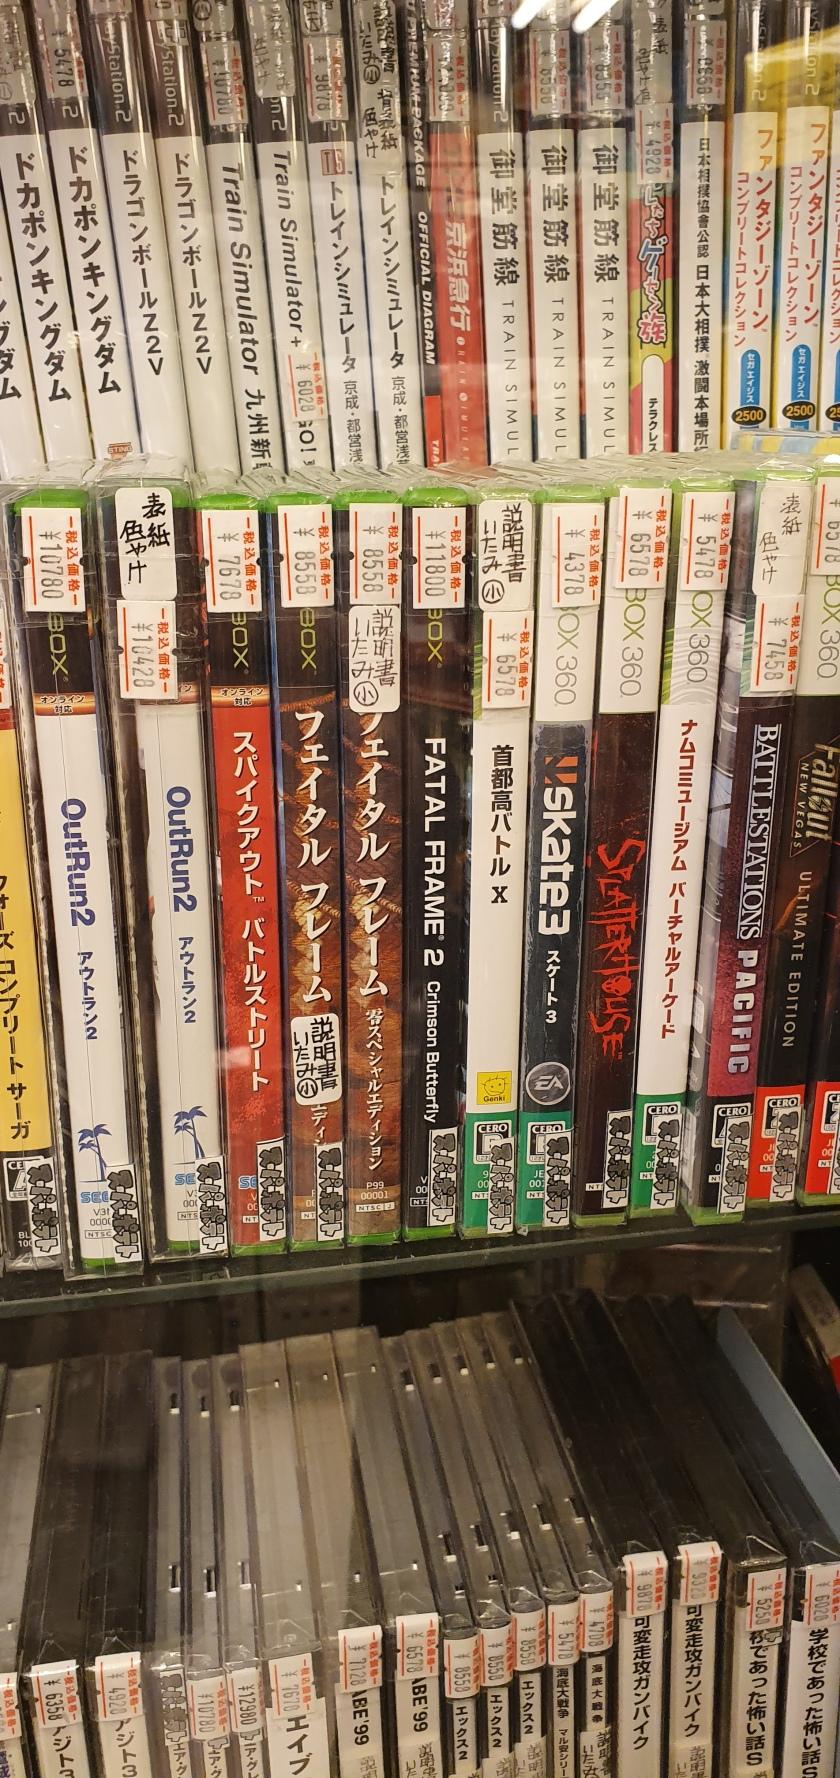 Original Xbox Games At Super Potato In Akihabara Tokyo